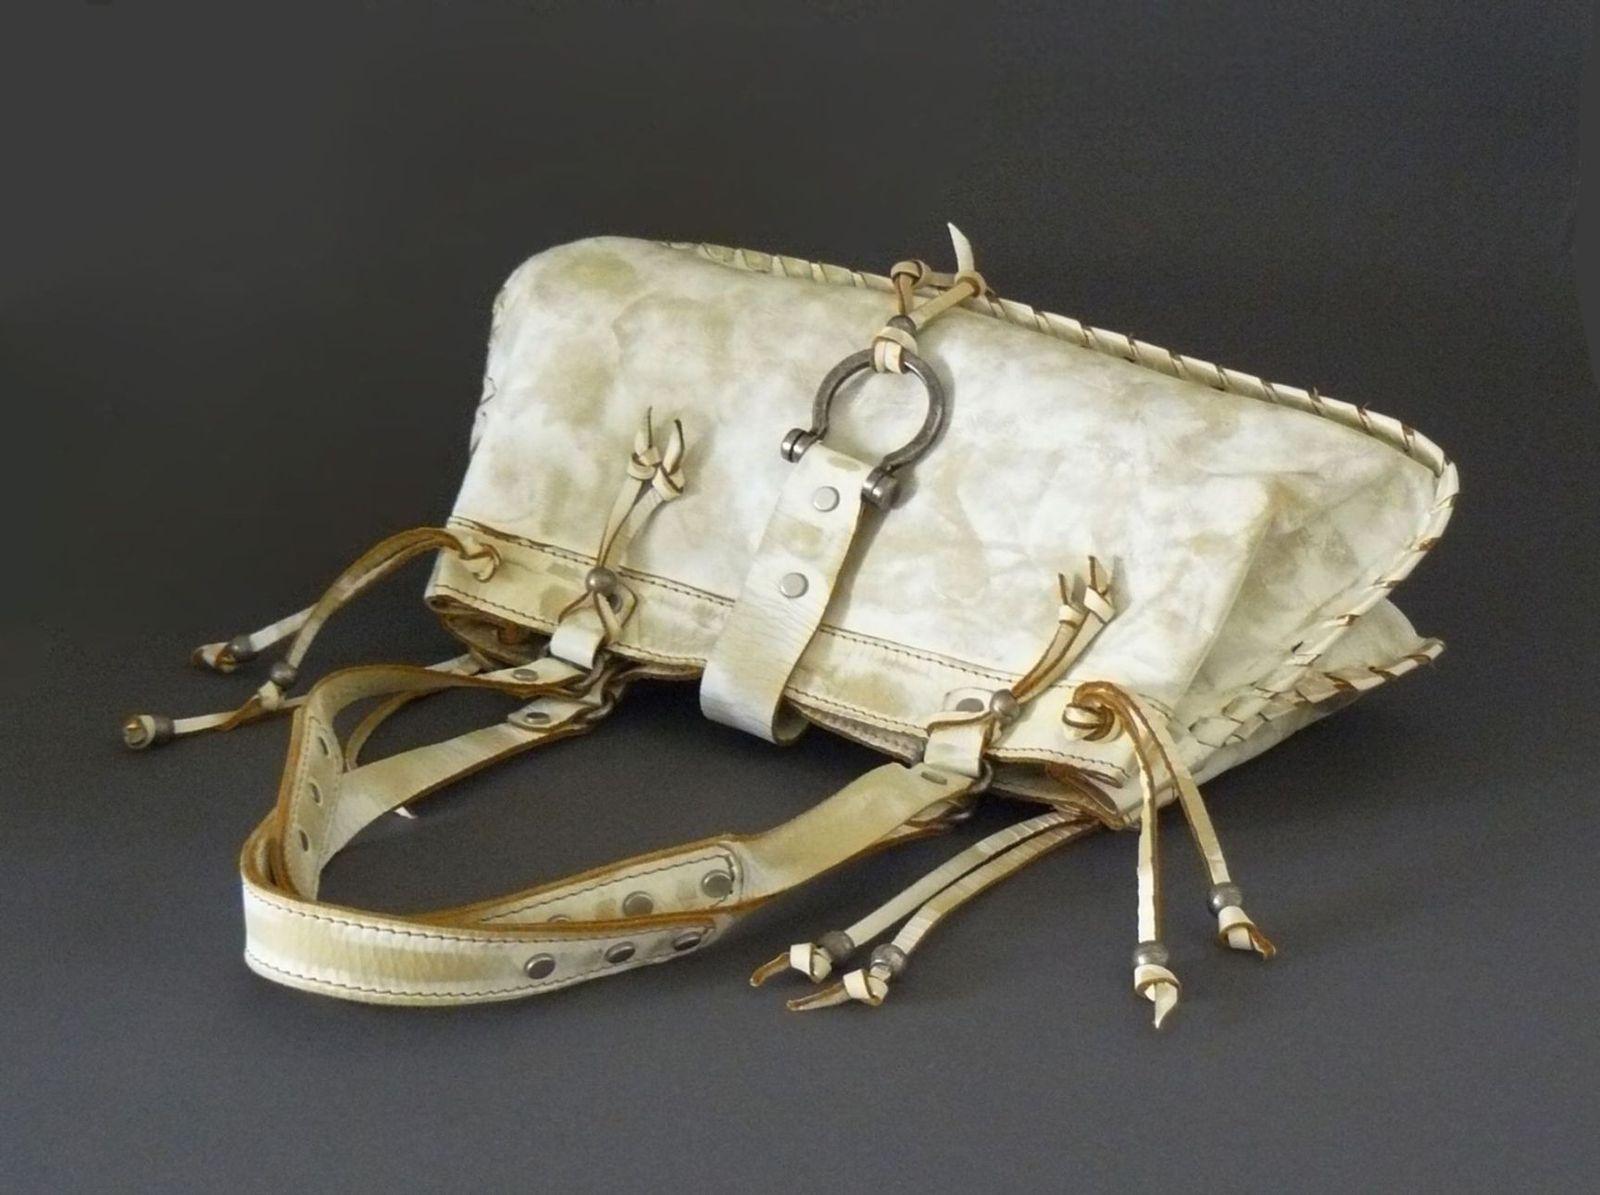 Vin Baker Handmade White Leather Boho Whip Stitched Shoulder Bag Made in USA